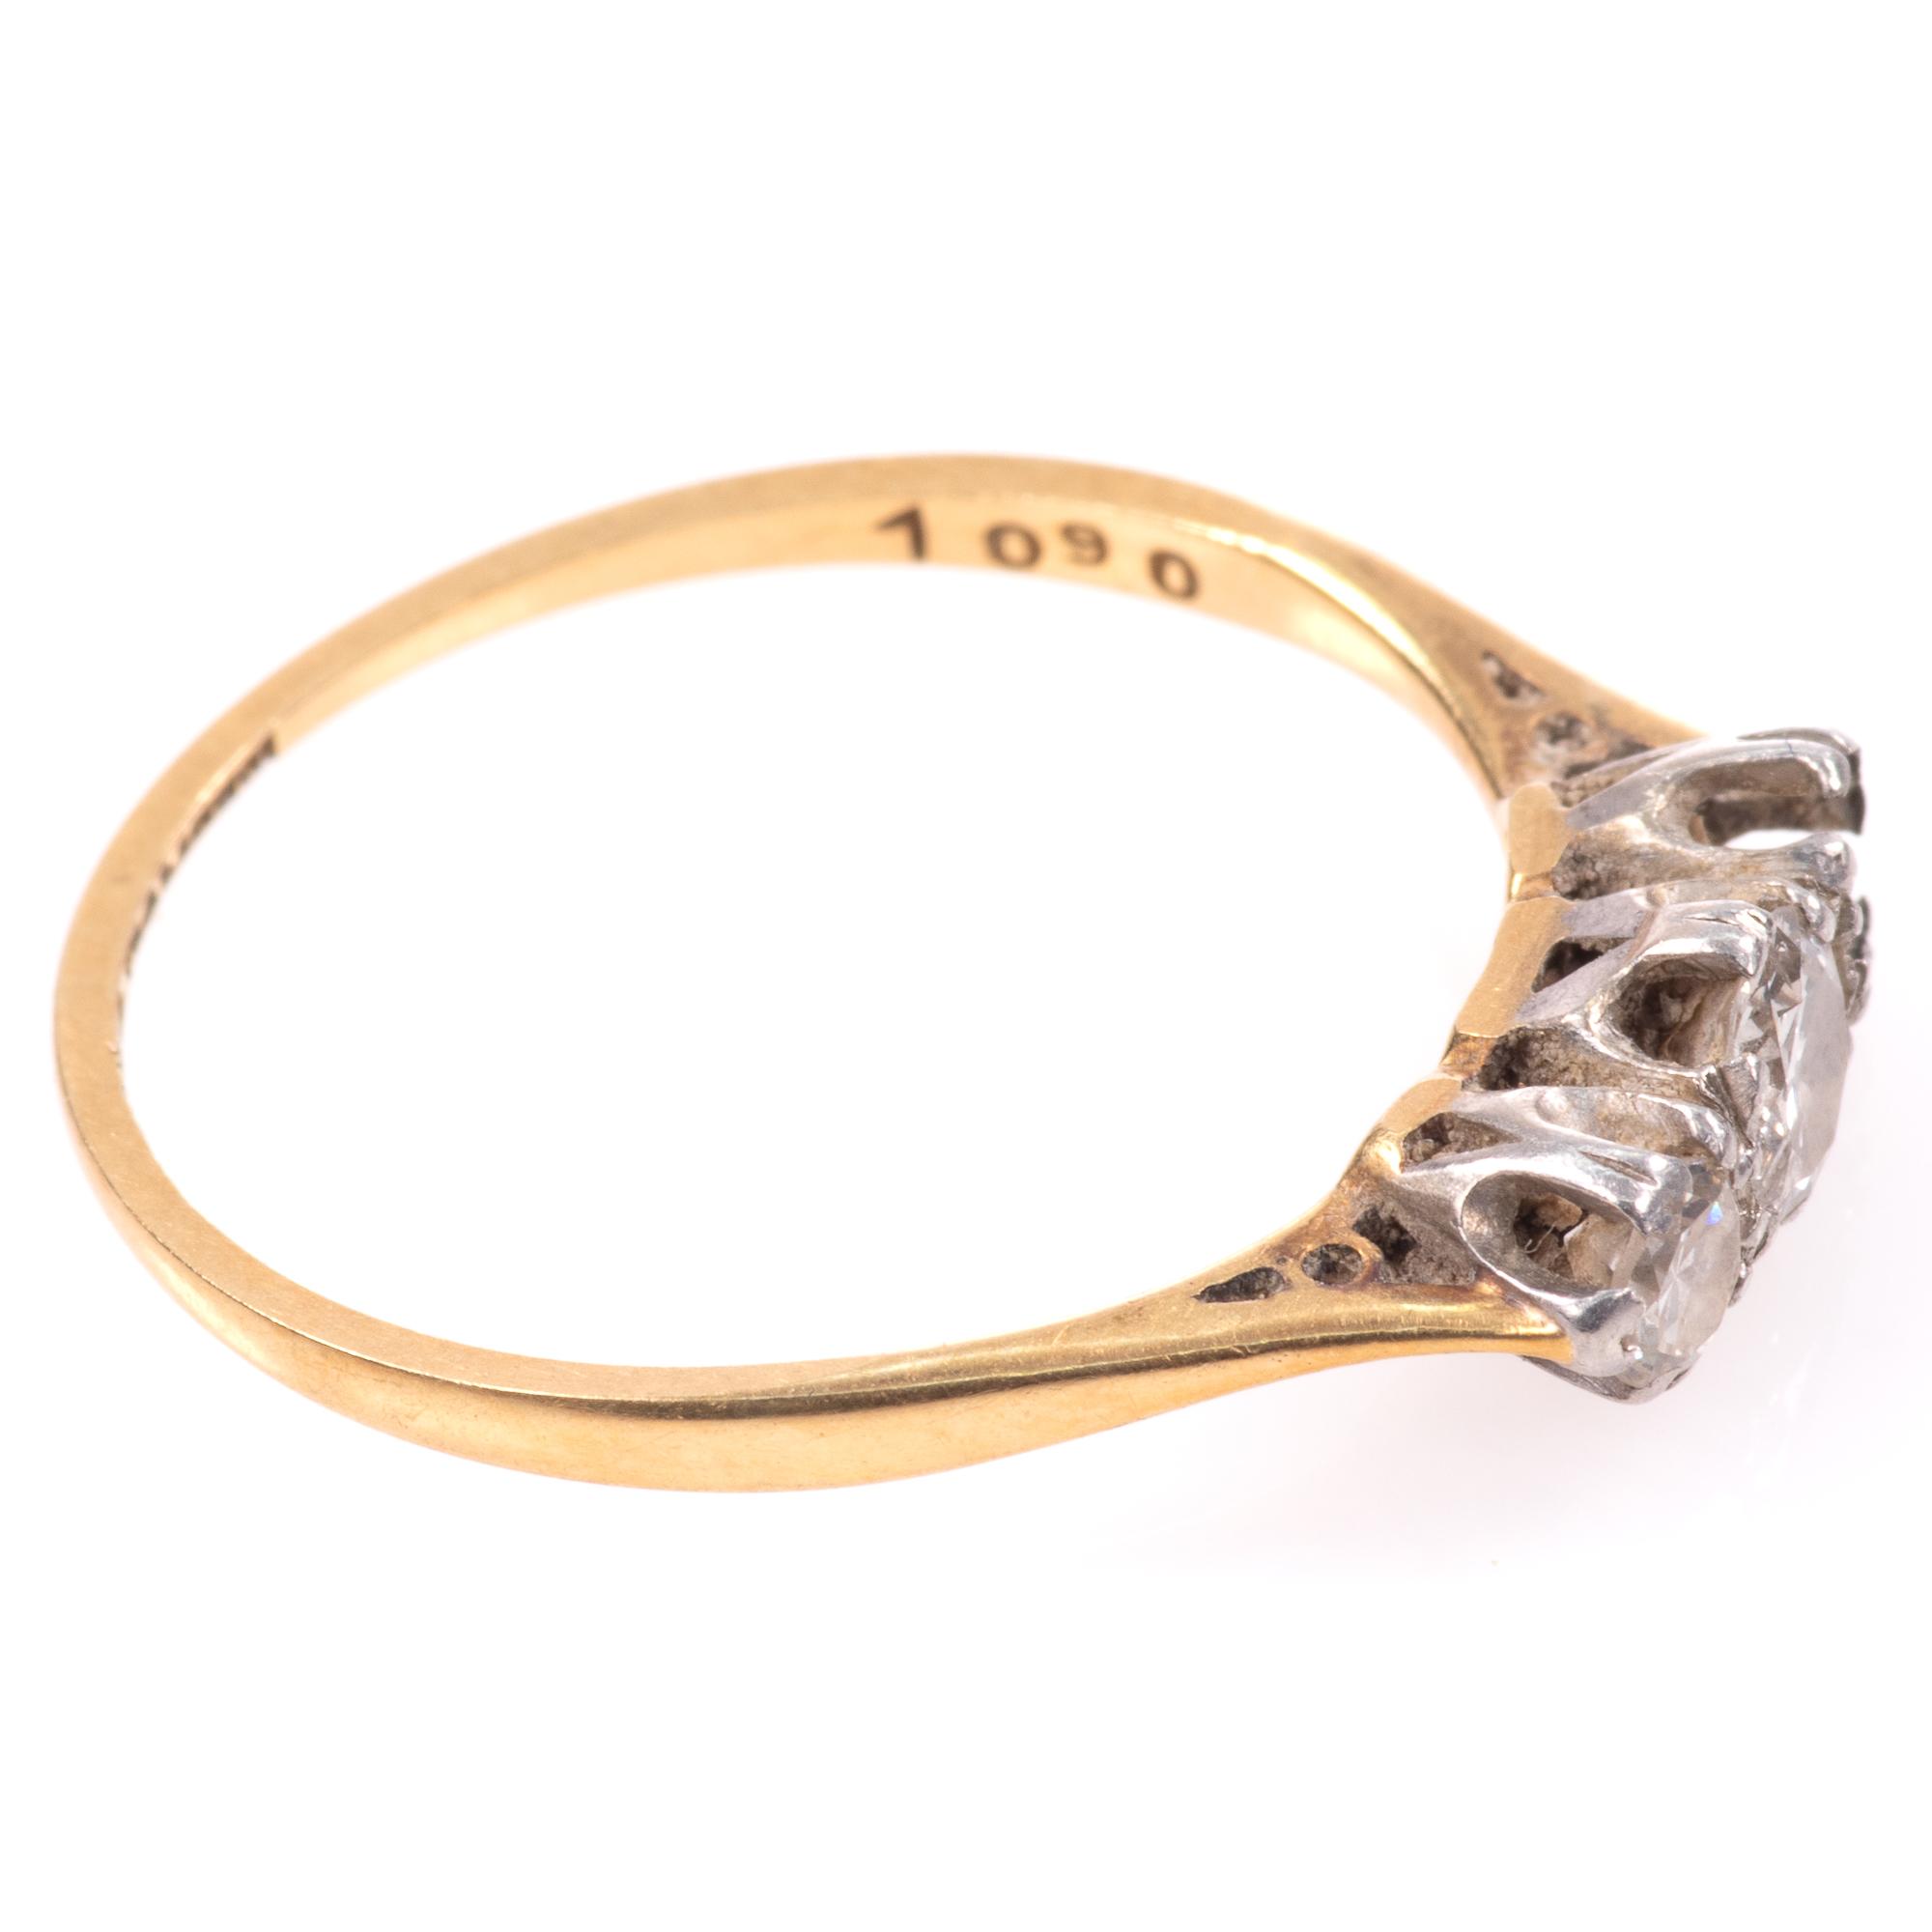 18ct Gold & Platinum 0.40ct Diamond Ring - Image 8 of 8